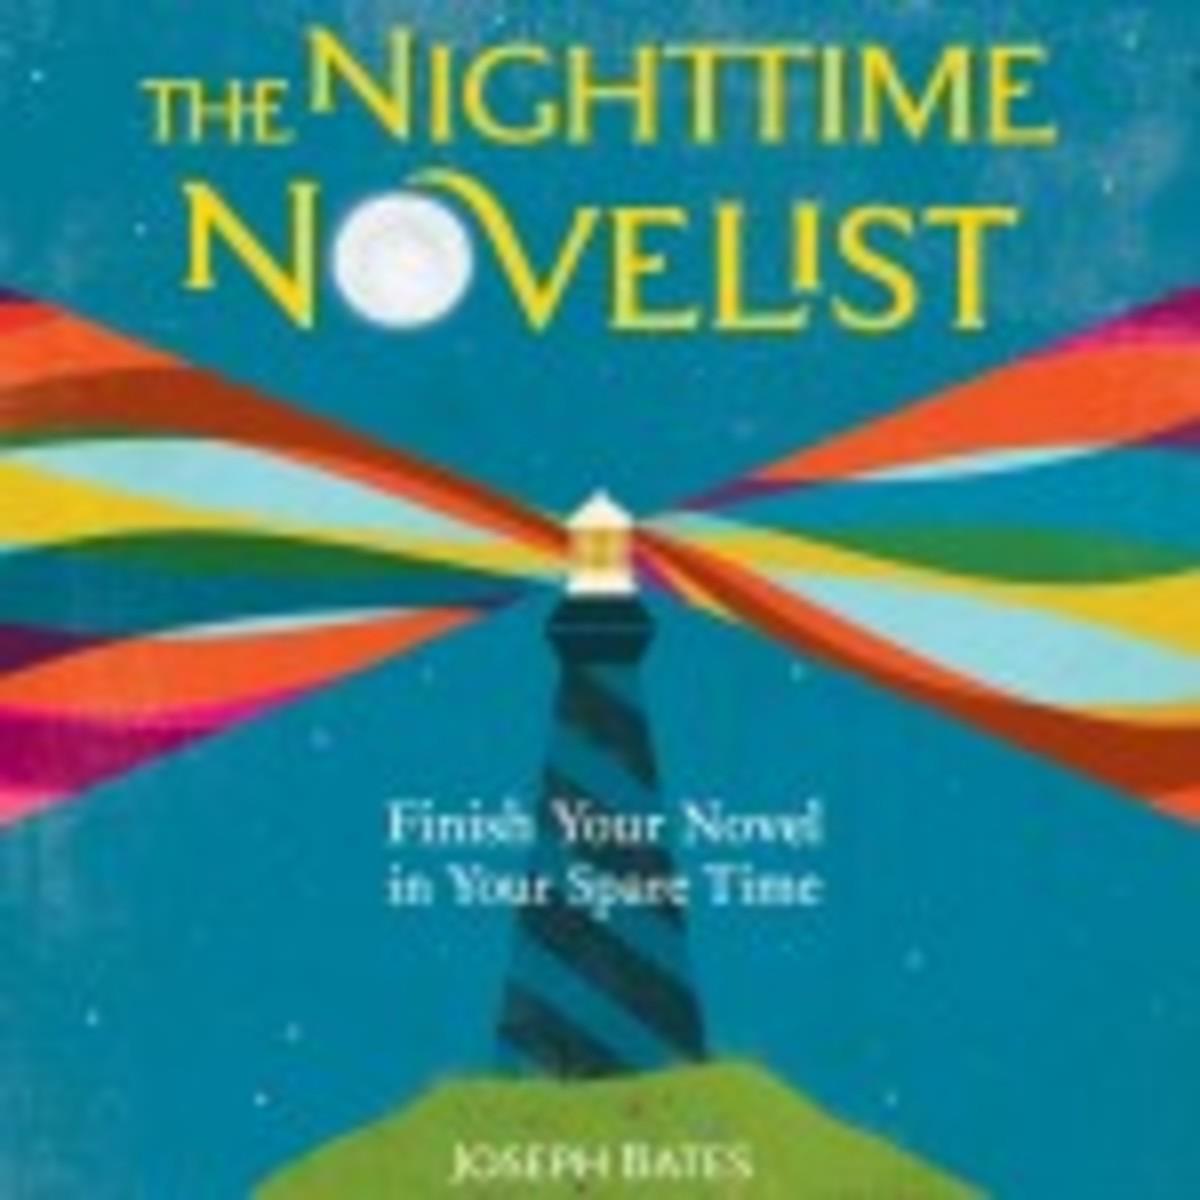 Novel writing tips | Nighttime Novelist